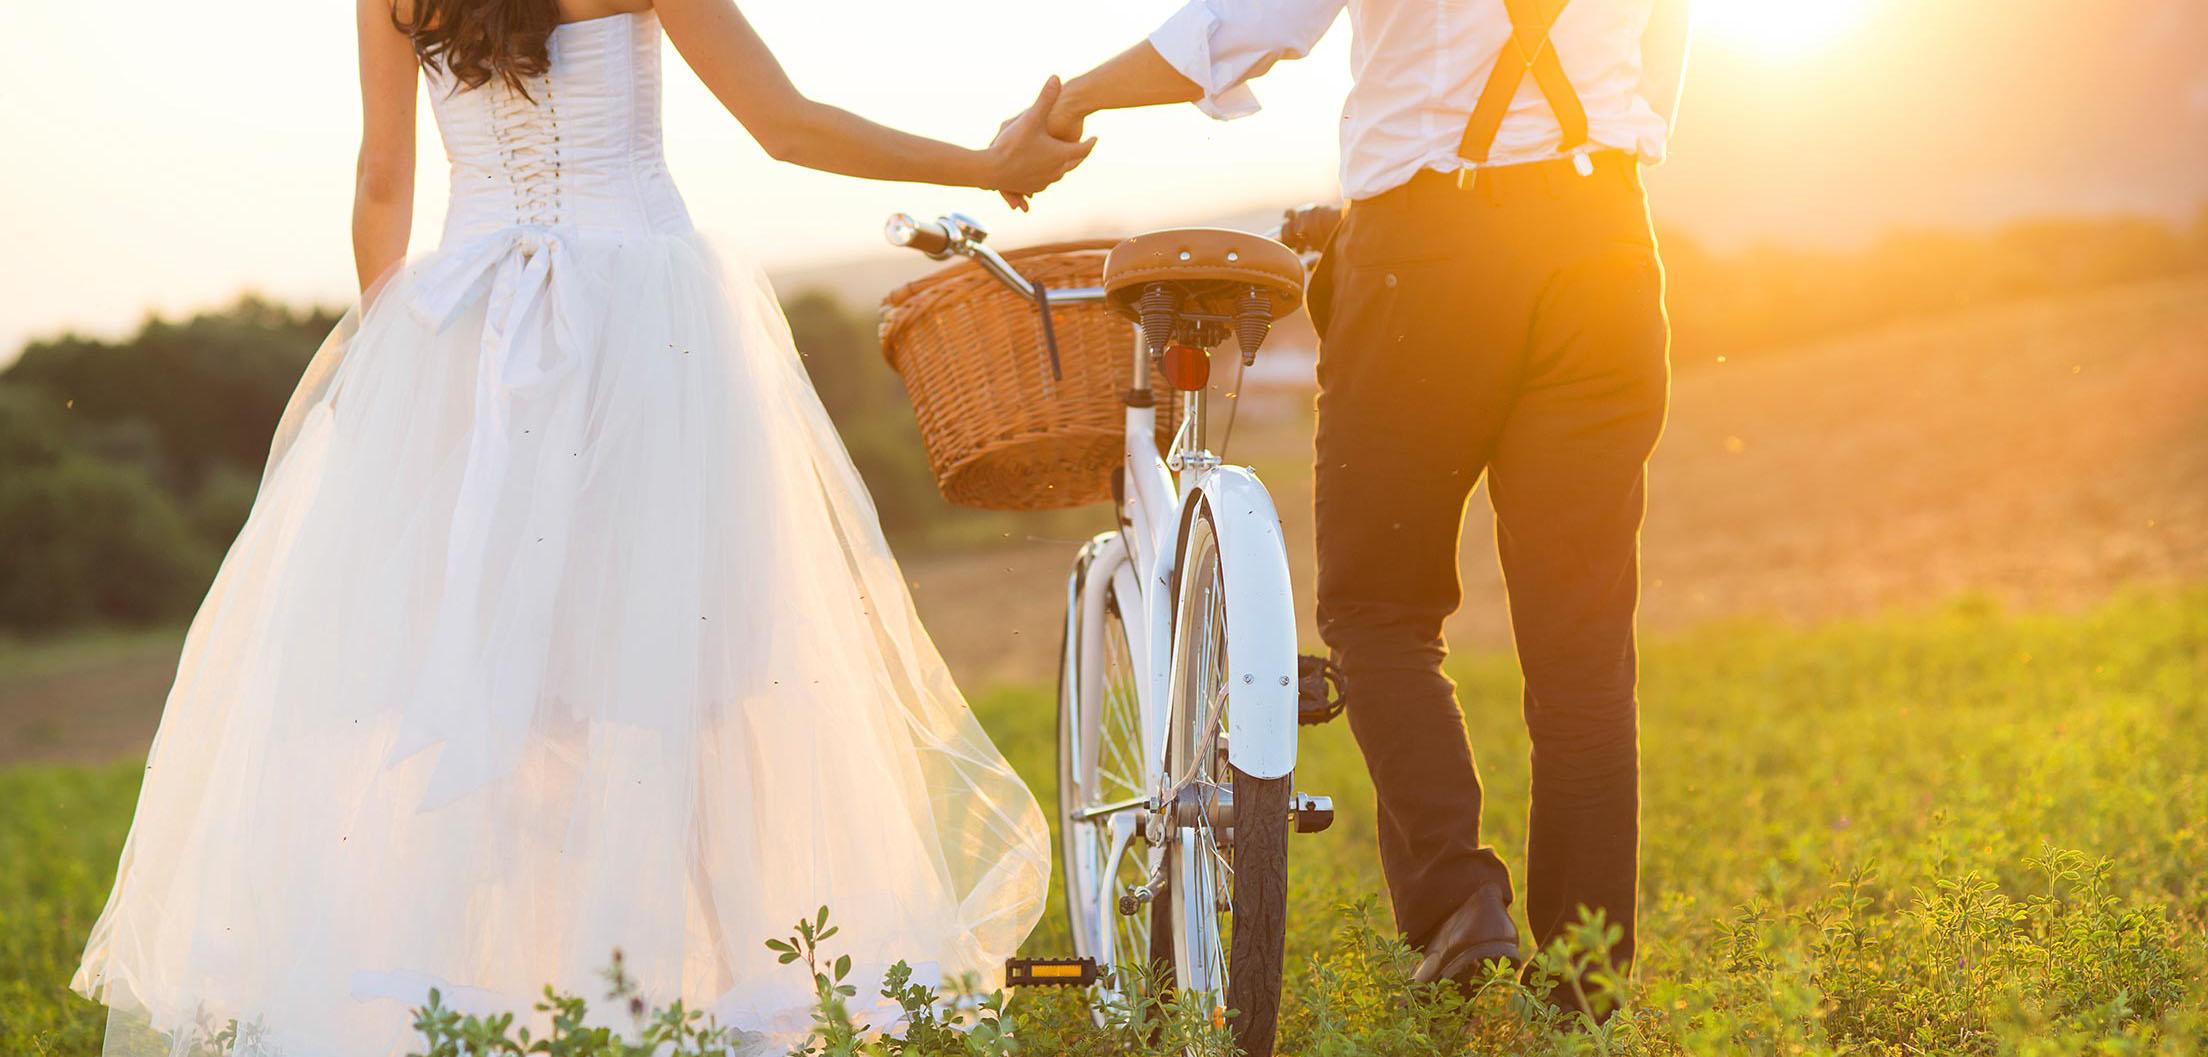 Liebe, Ehe, Paar